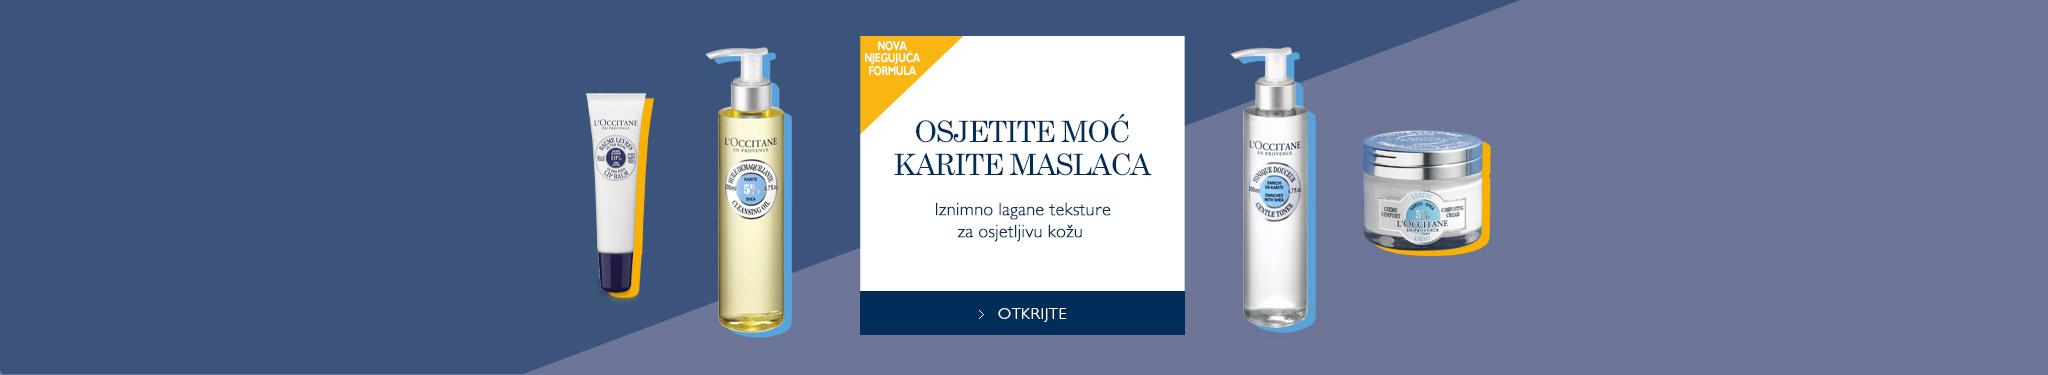 SNAGA KARITE MASLACA